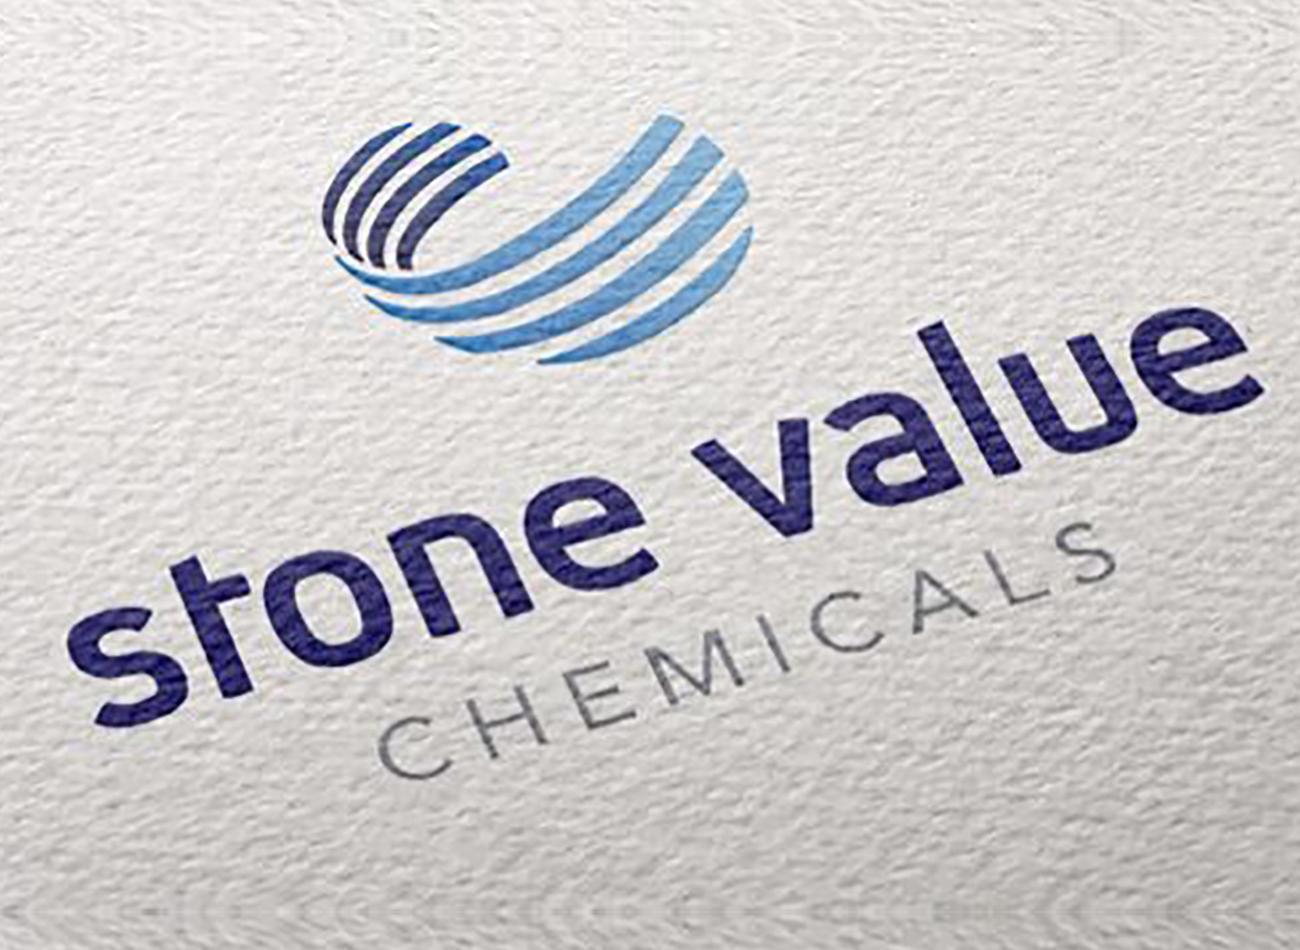 Stone-Value-Logo-Case-Study-Corporate-Identity-Agent-Orange-Design-Thumbnail.jpg